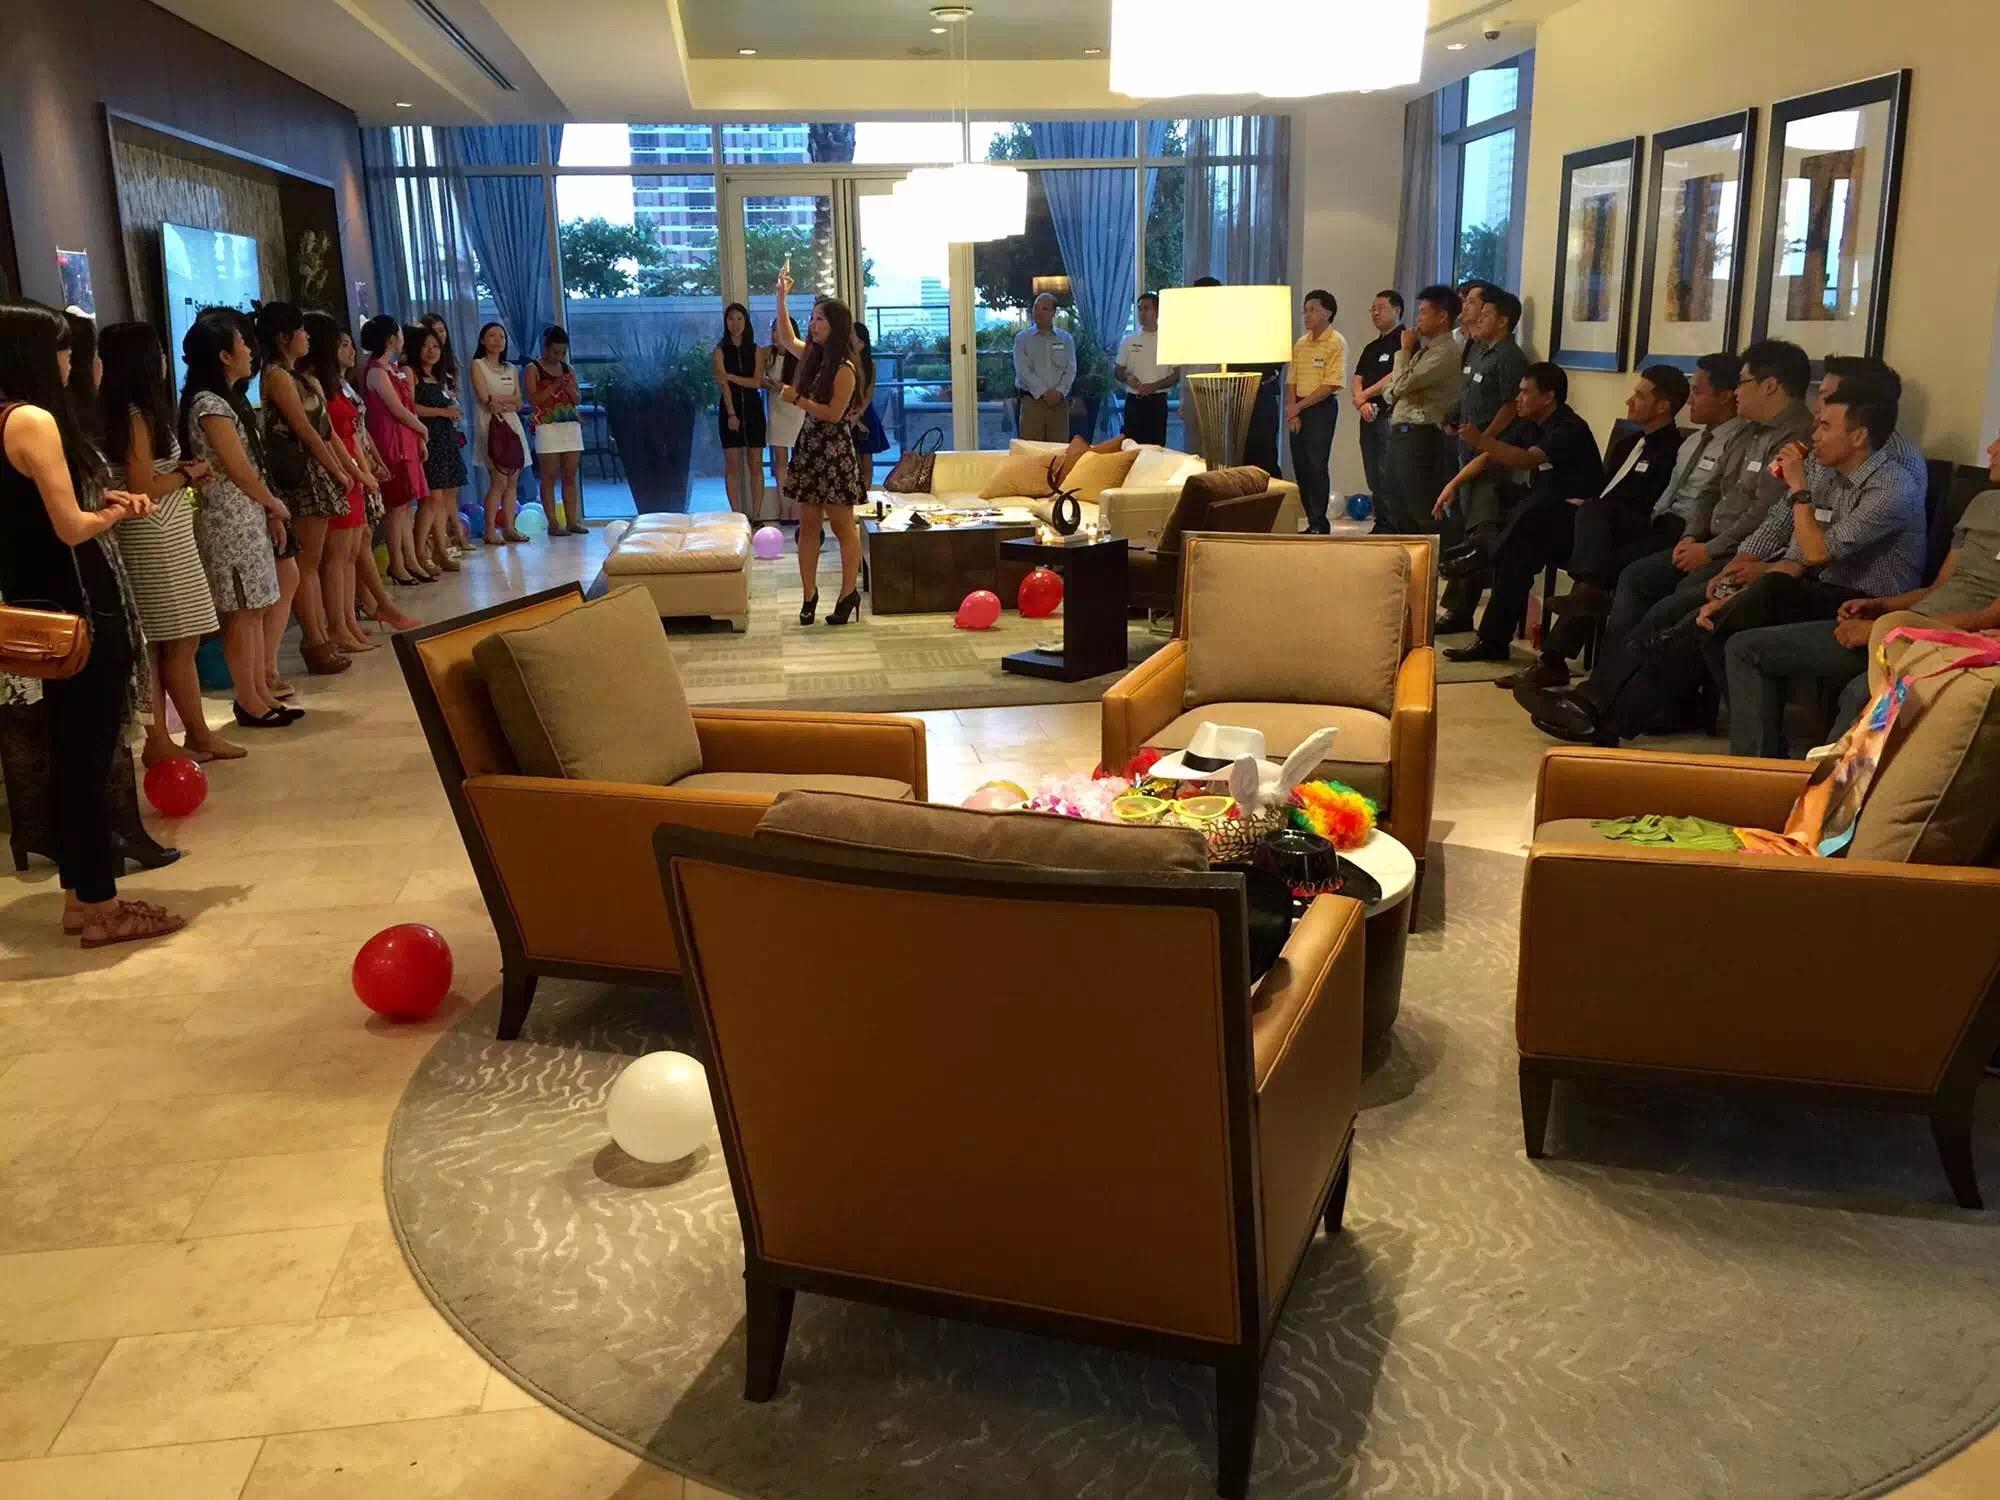 Houston Wedding Planning | Professional & Personal Design|Houston Planner Wedding|Best Houston Wedd